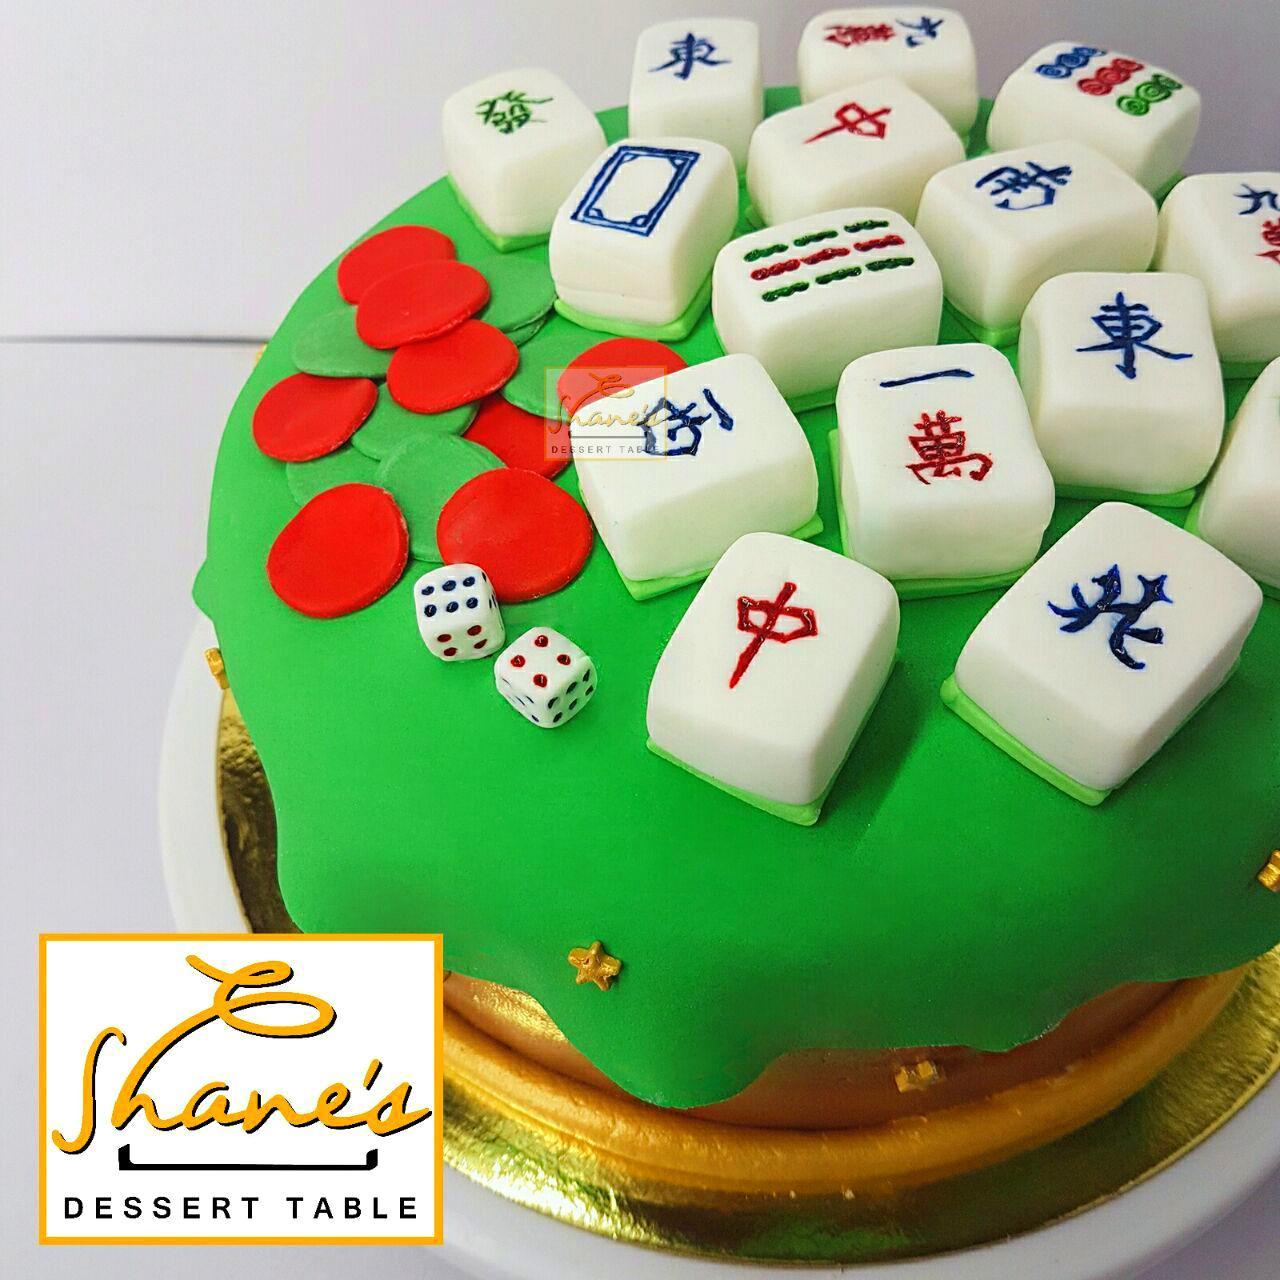 Mahjong Cake Shanes Dessert Table